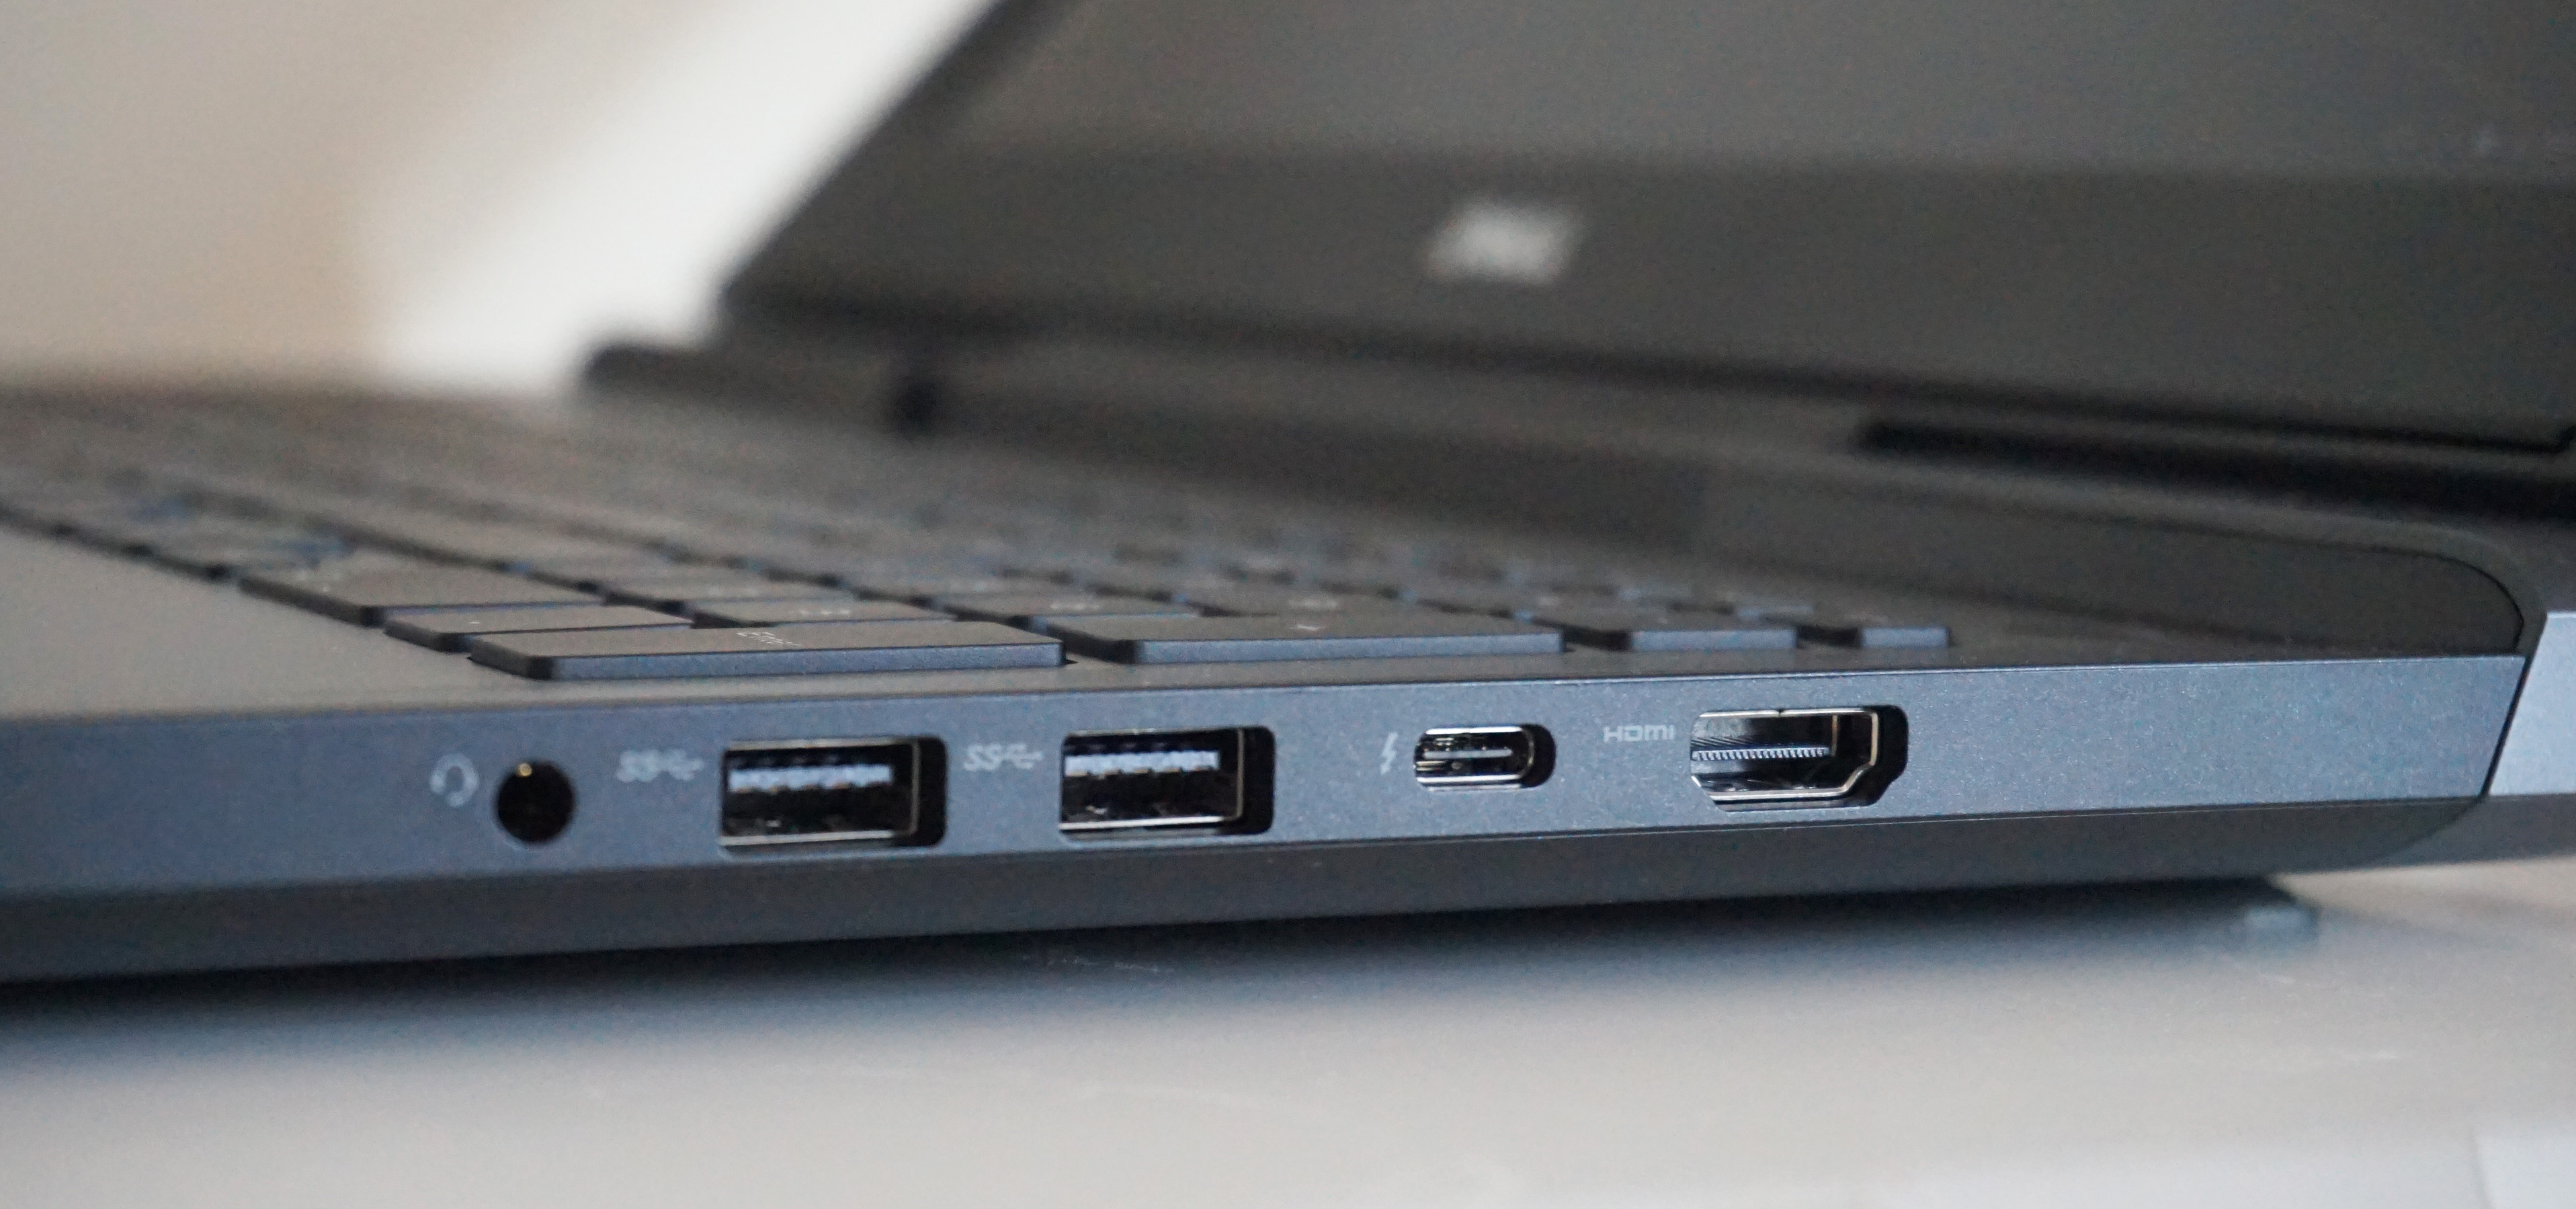 Dell Inspiron G5 15 review | Rock Paper Shotgun